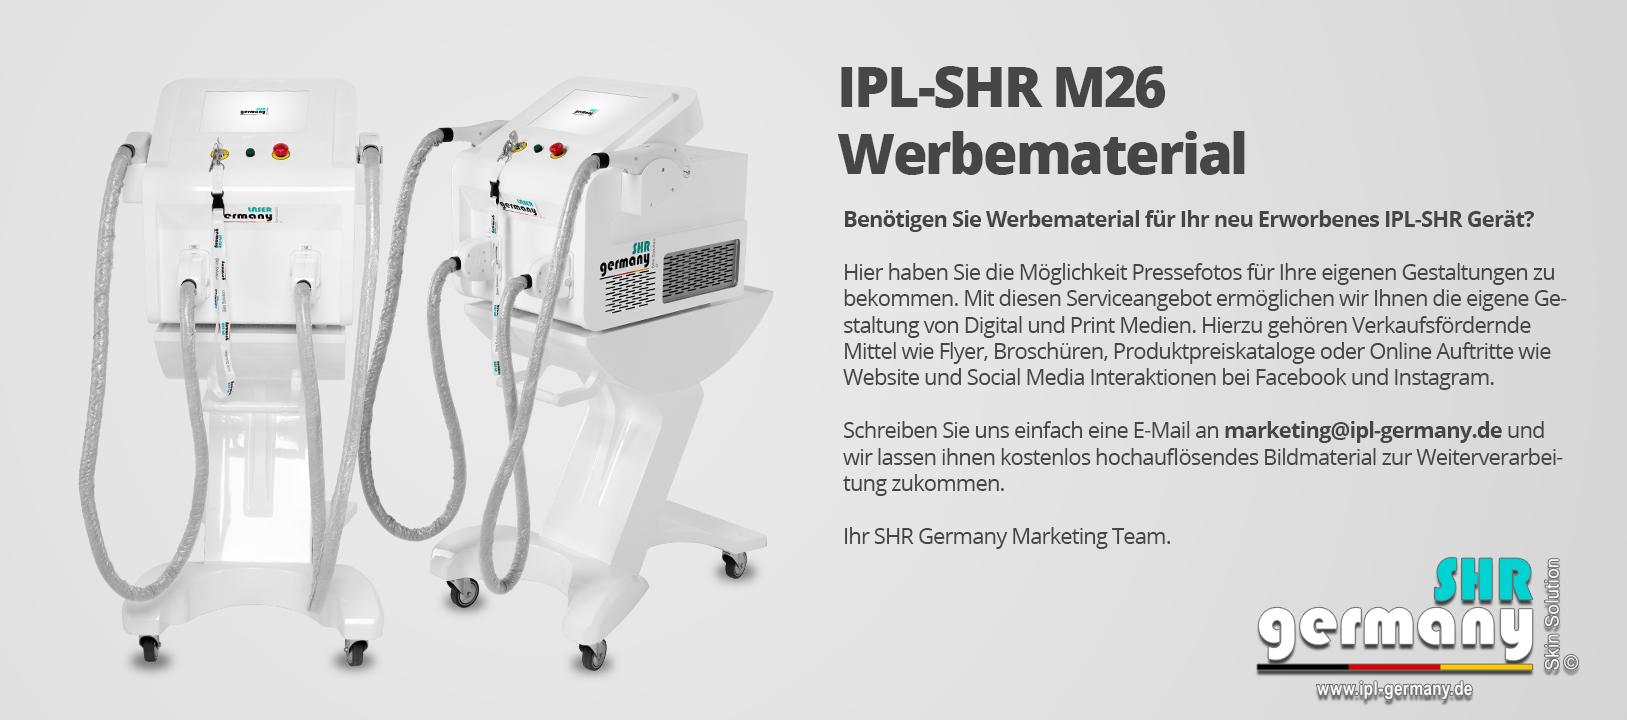 SHR_Germany_M26_Werbematerial_IPL